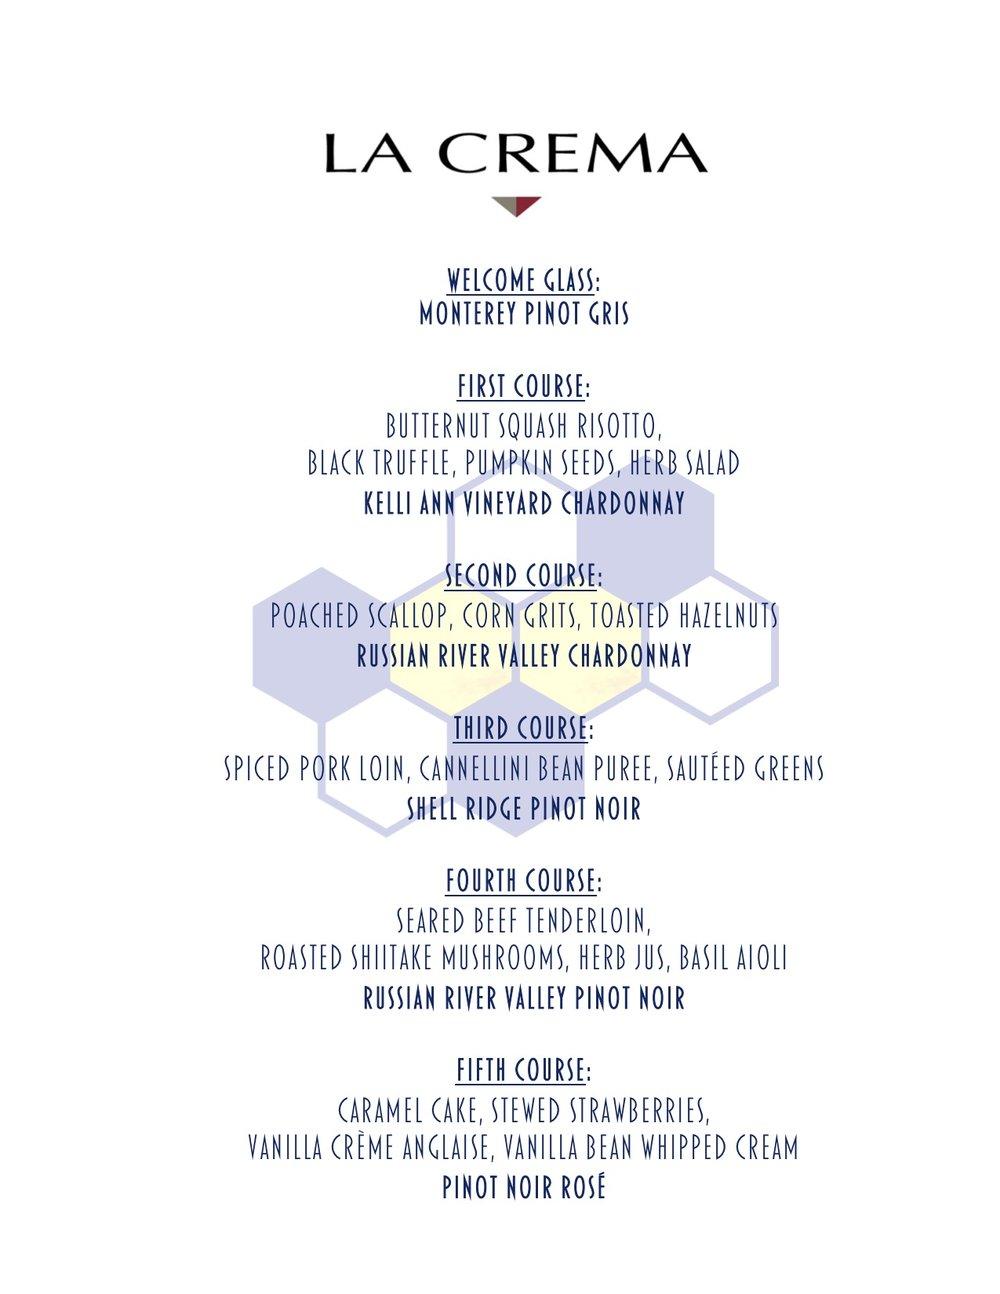 La Crema 2019 Dinner.jpg